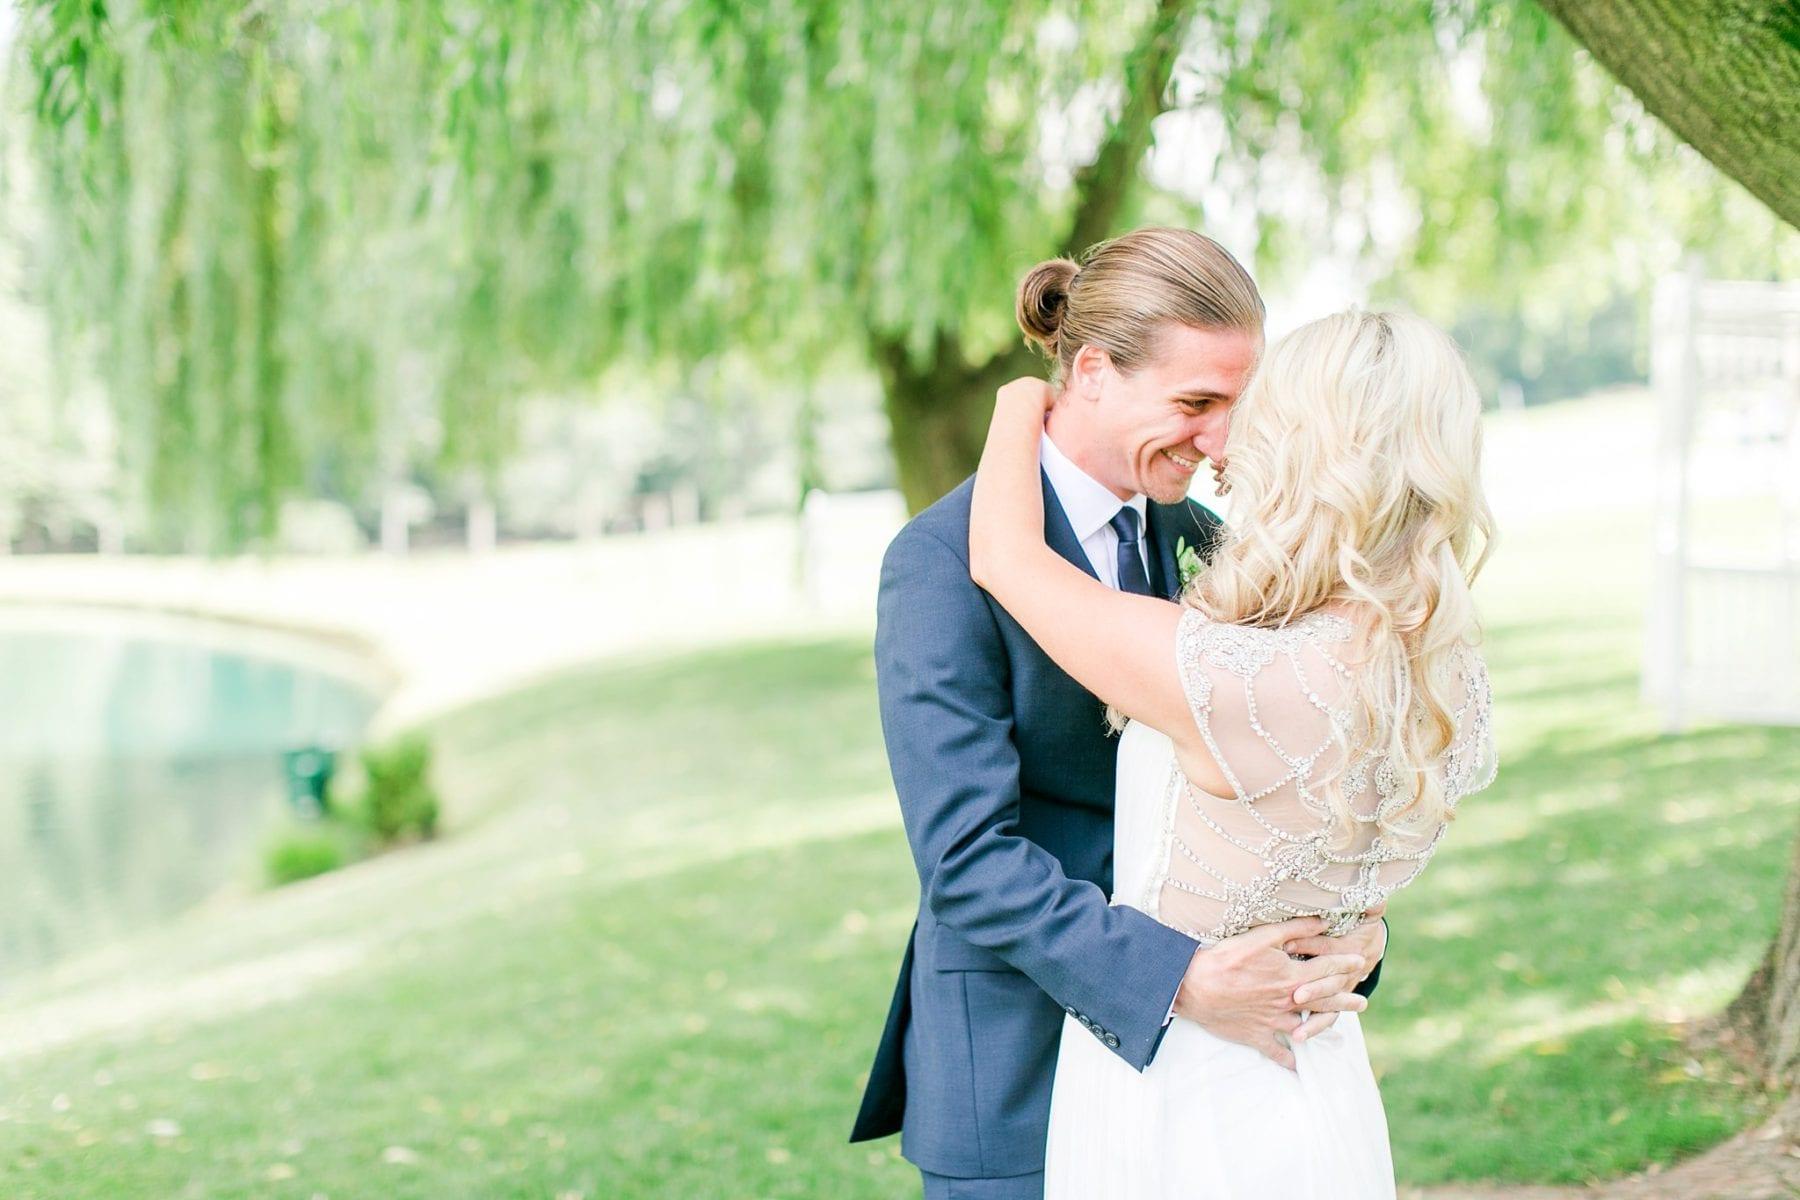 Pond View Farm Wedding Photos Maryland Wedding Photographer Kristen & Ryan Megan Kelsey Photography Blog-86.jpg